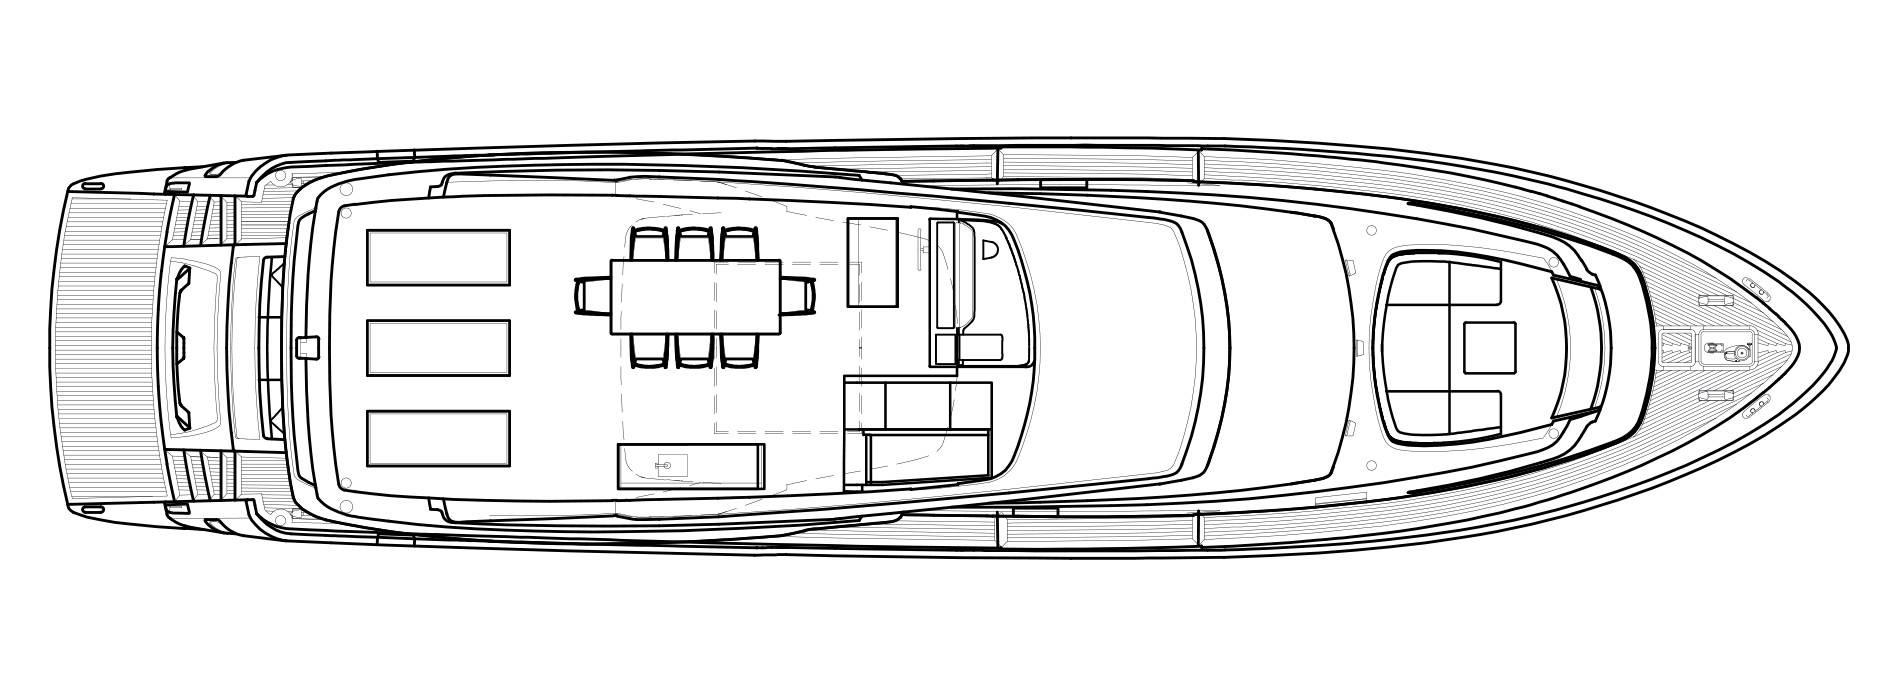 Sanlorenzo Yachts SL78 Флайбридж